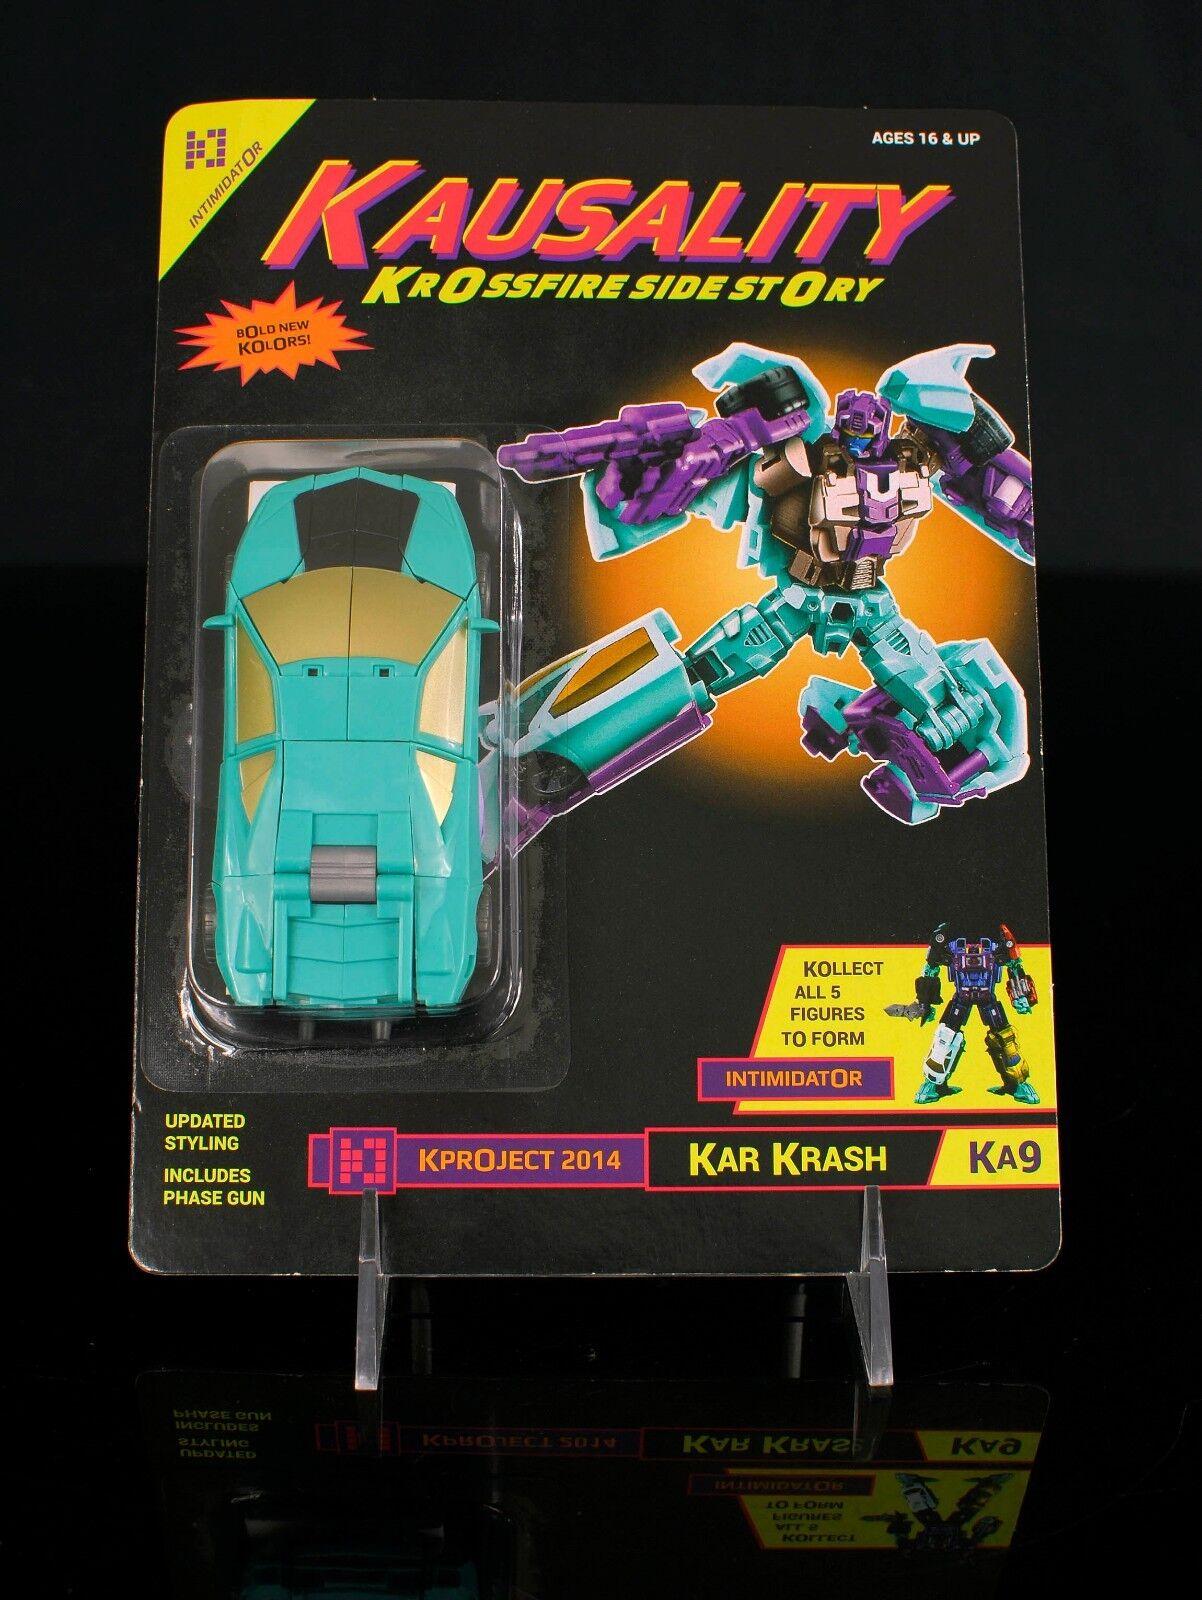 Fansproject Kausality Causality Kar Krash (G2 Breakdown) nuovo &  MOC Transformers  Garanzia di vestibilità al 100%